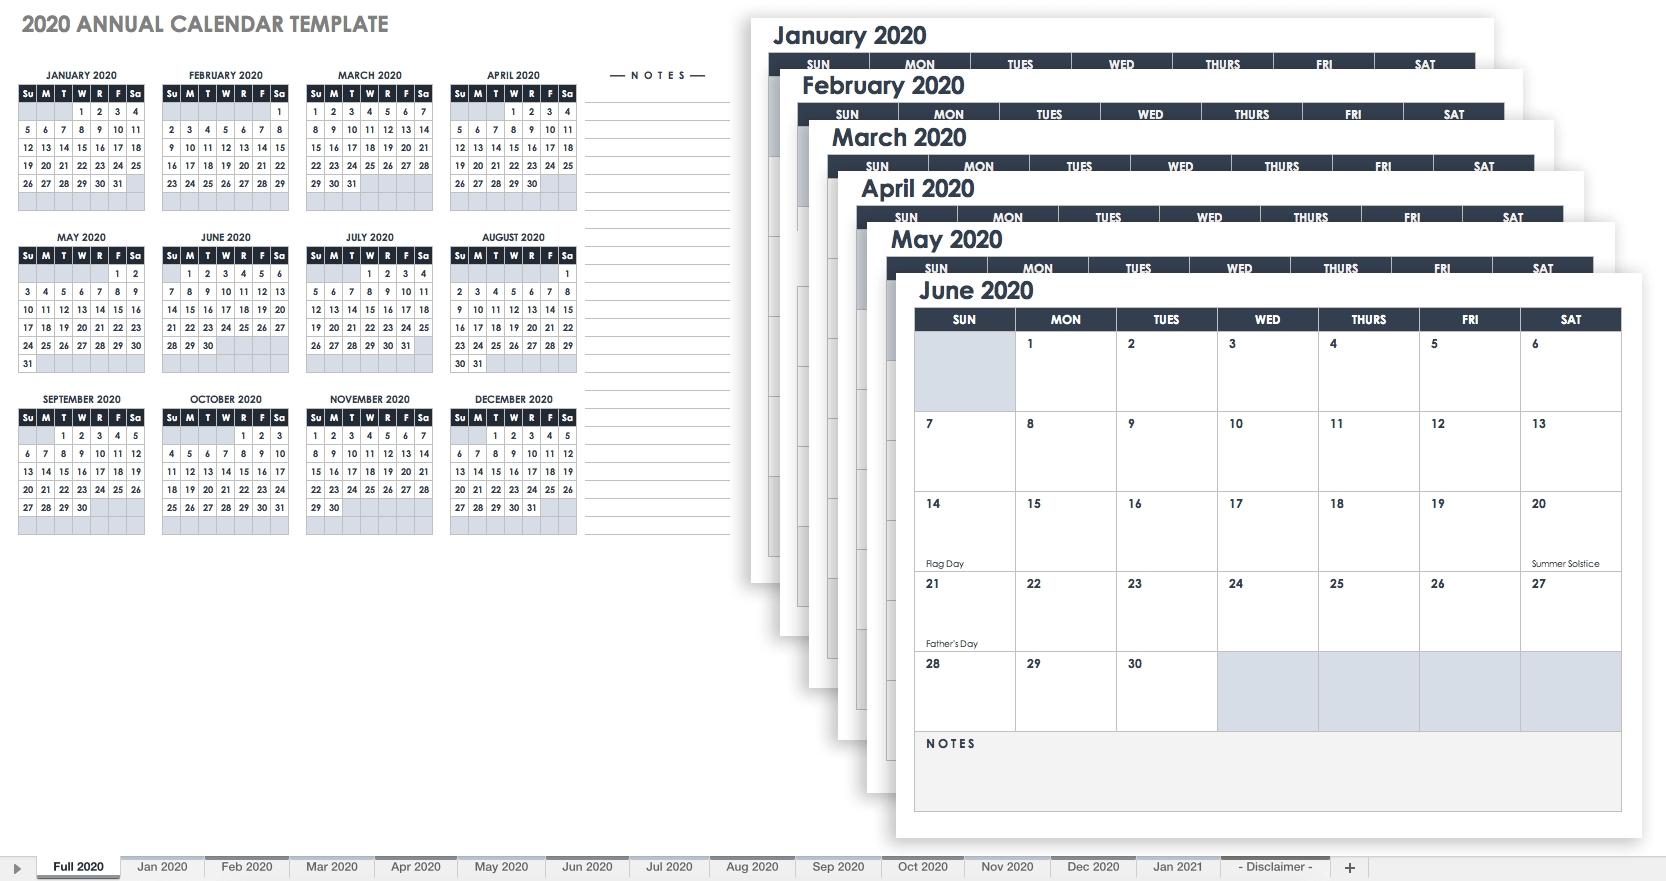 Free Blank Calendar Templates - Smartsheet with regard to August 29 Hourly Schedule Template